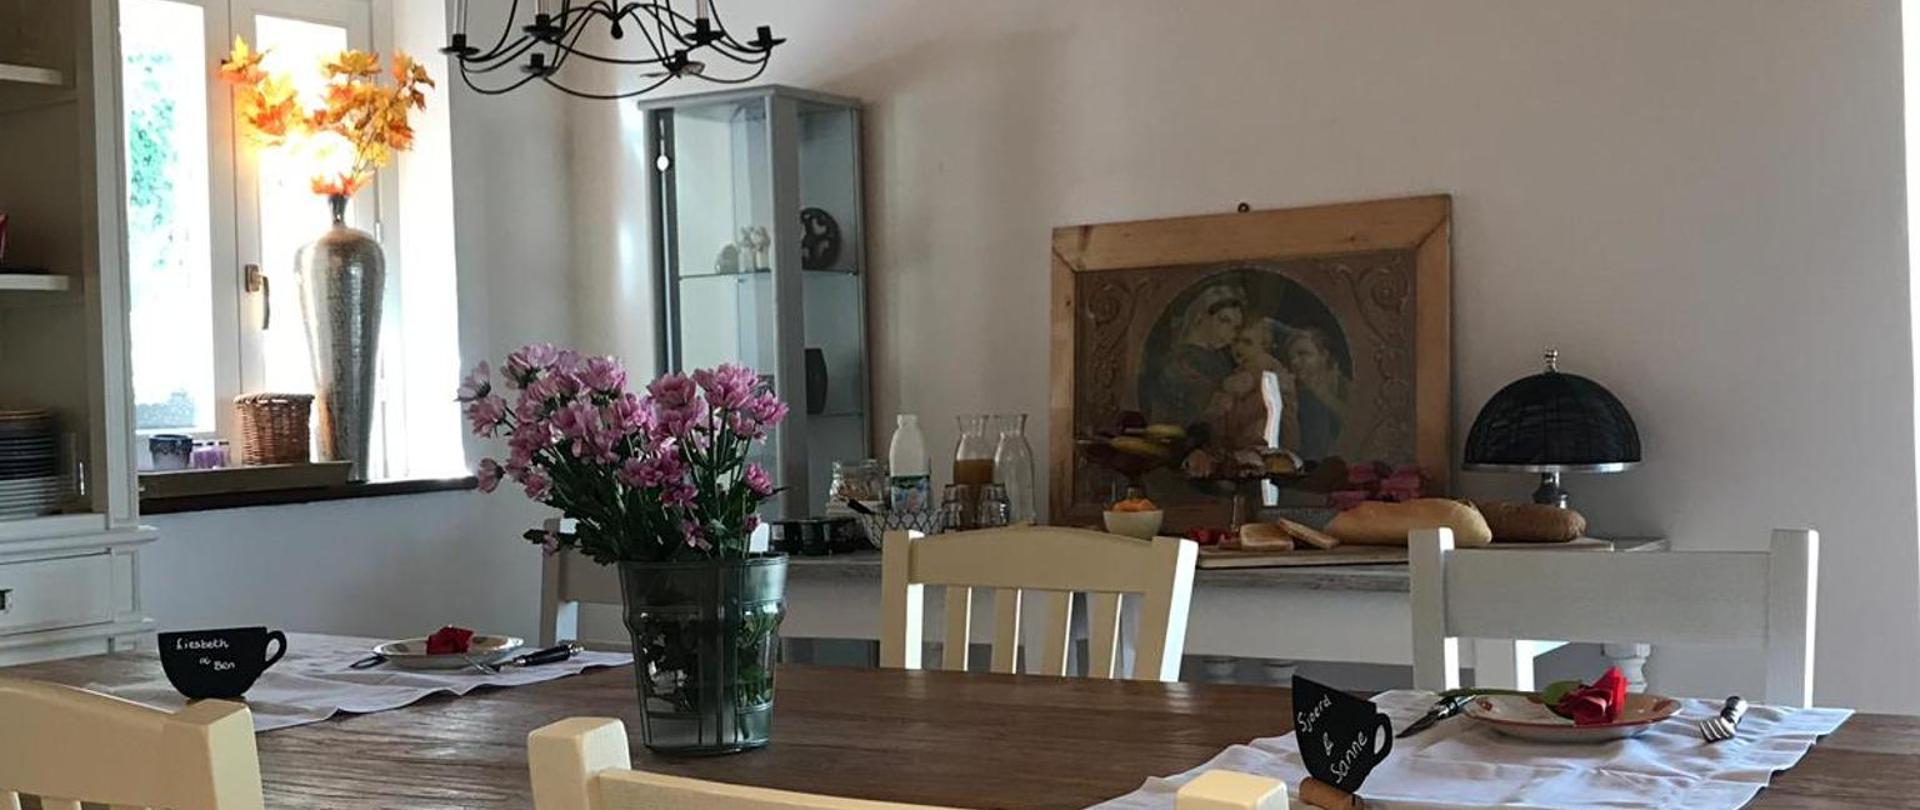 Breakfastroom 4.JPG